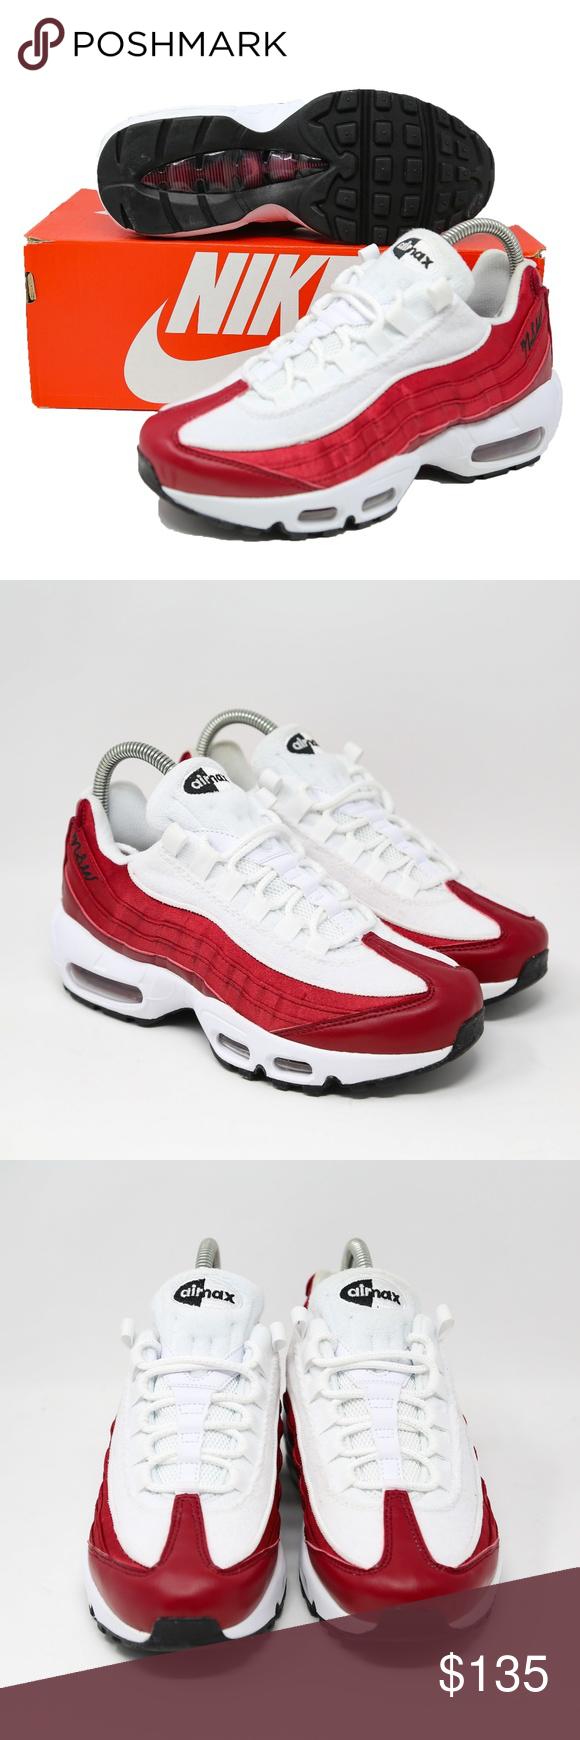 NWT Womens Nike Air Max 95 LX NSW Running Shoes Red White AA1103 601 SZ 7.5 | eBay